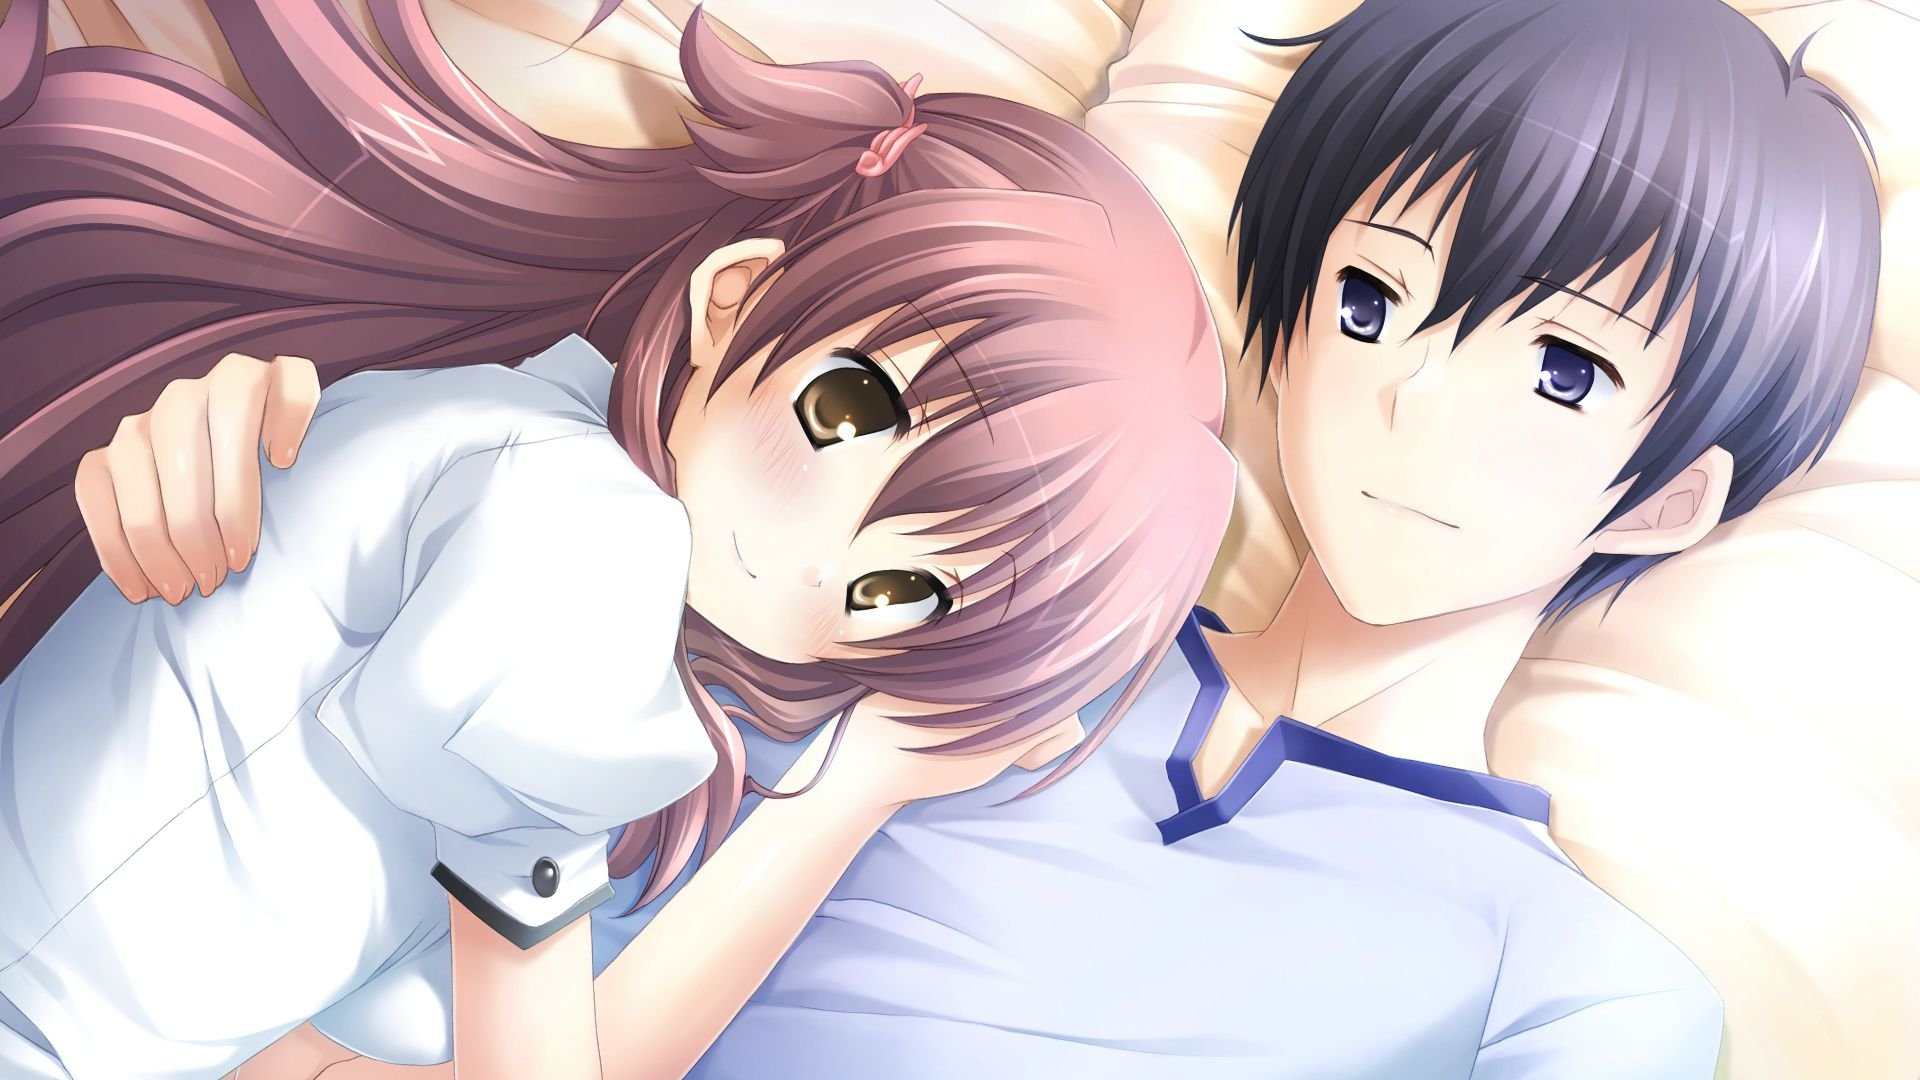 Anime Girl Guy Skirt Blouse Anime Hug Hugging Couple Love Mood People Men Women Happy B Wallpaper 1920x1080 807023 Wallpaperup Download, share or upload your own one! anime girl guy skirt blouse anime hug